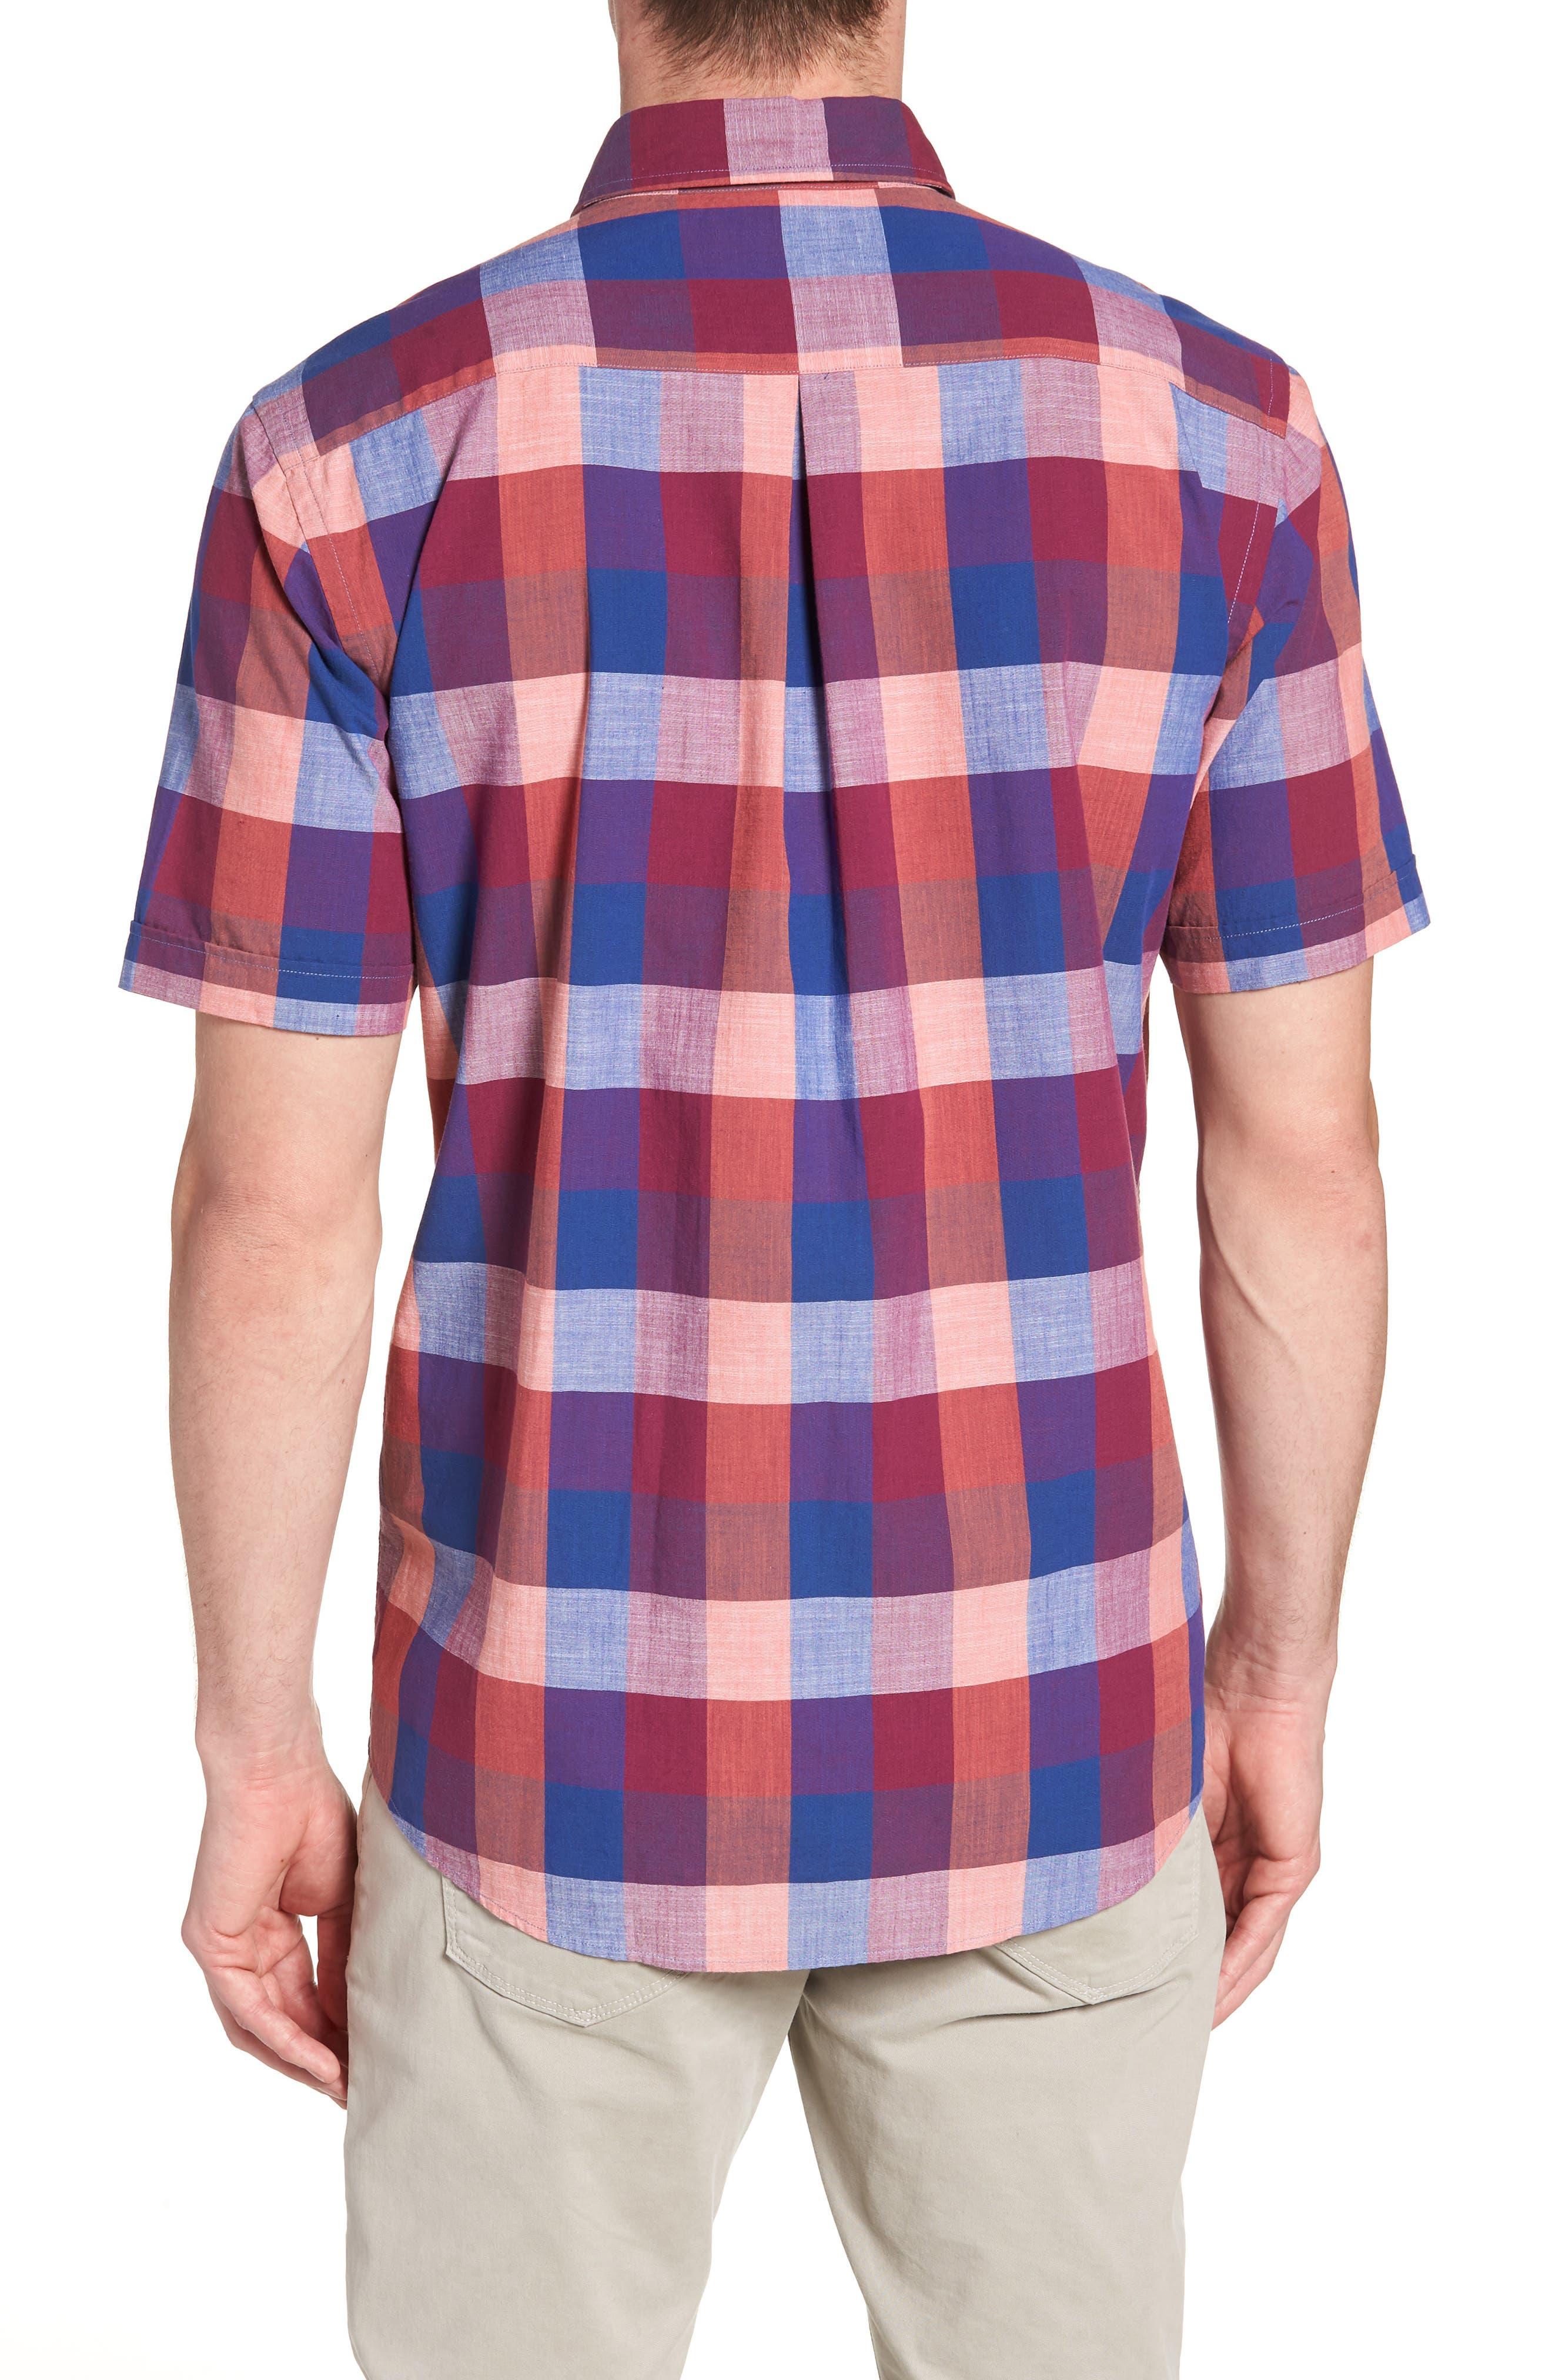 Knighton Regular Fit Sport Shirt,                             Alternate thumbnail 3, color,                             Berry